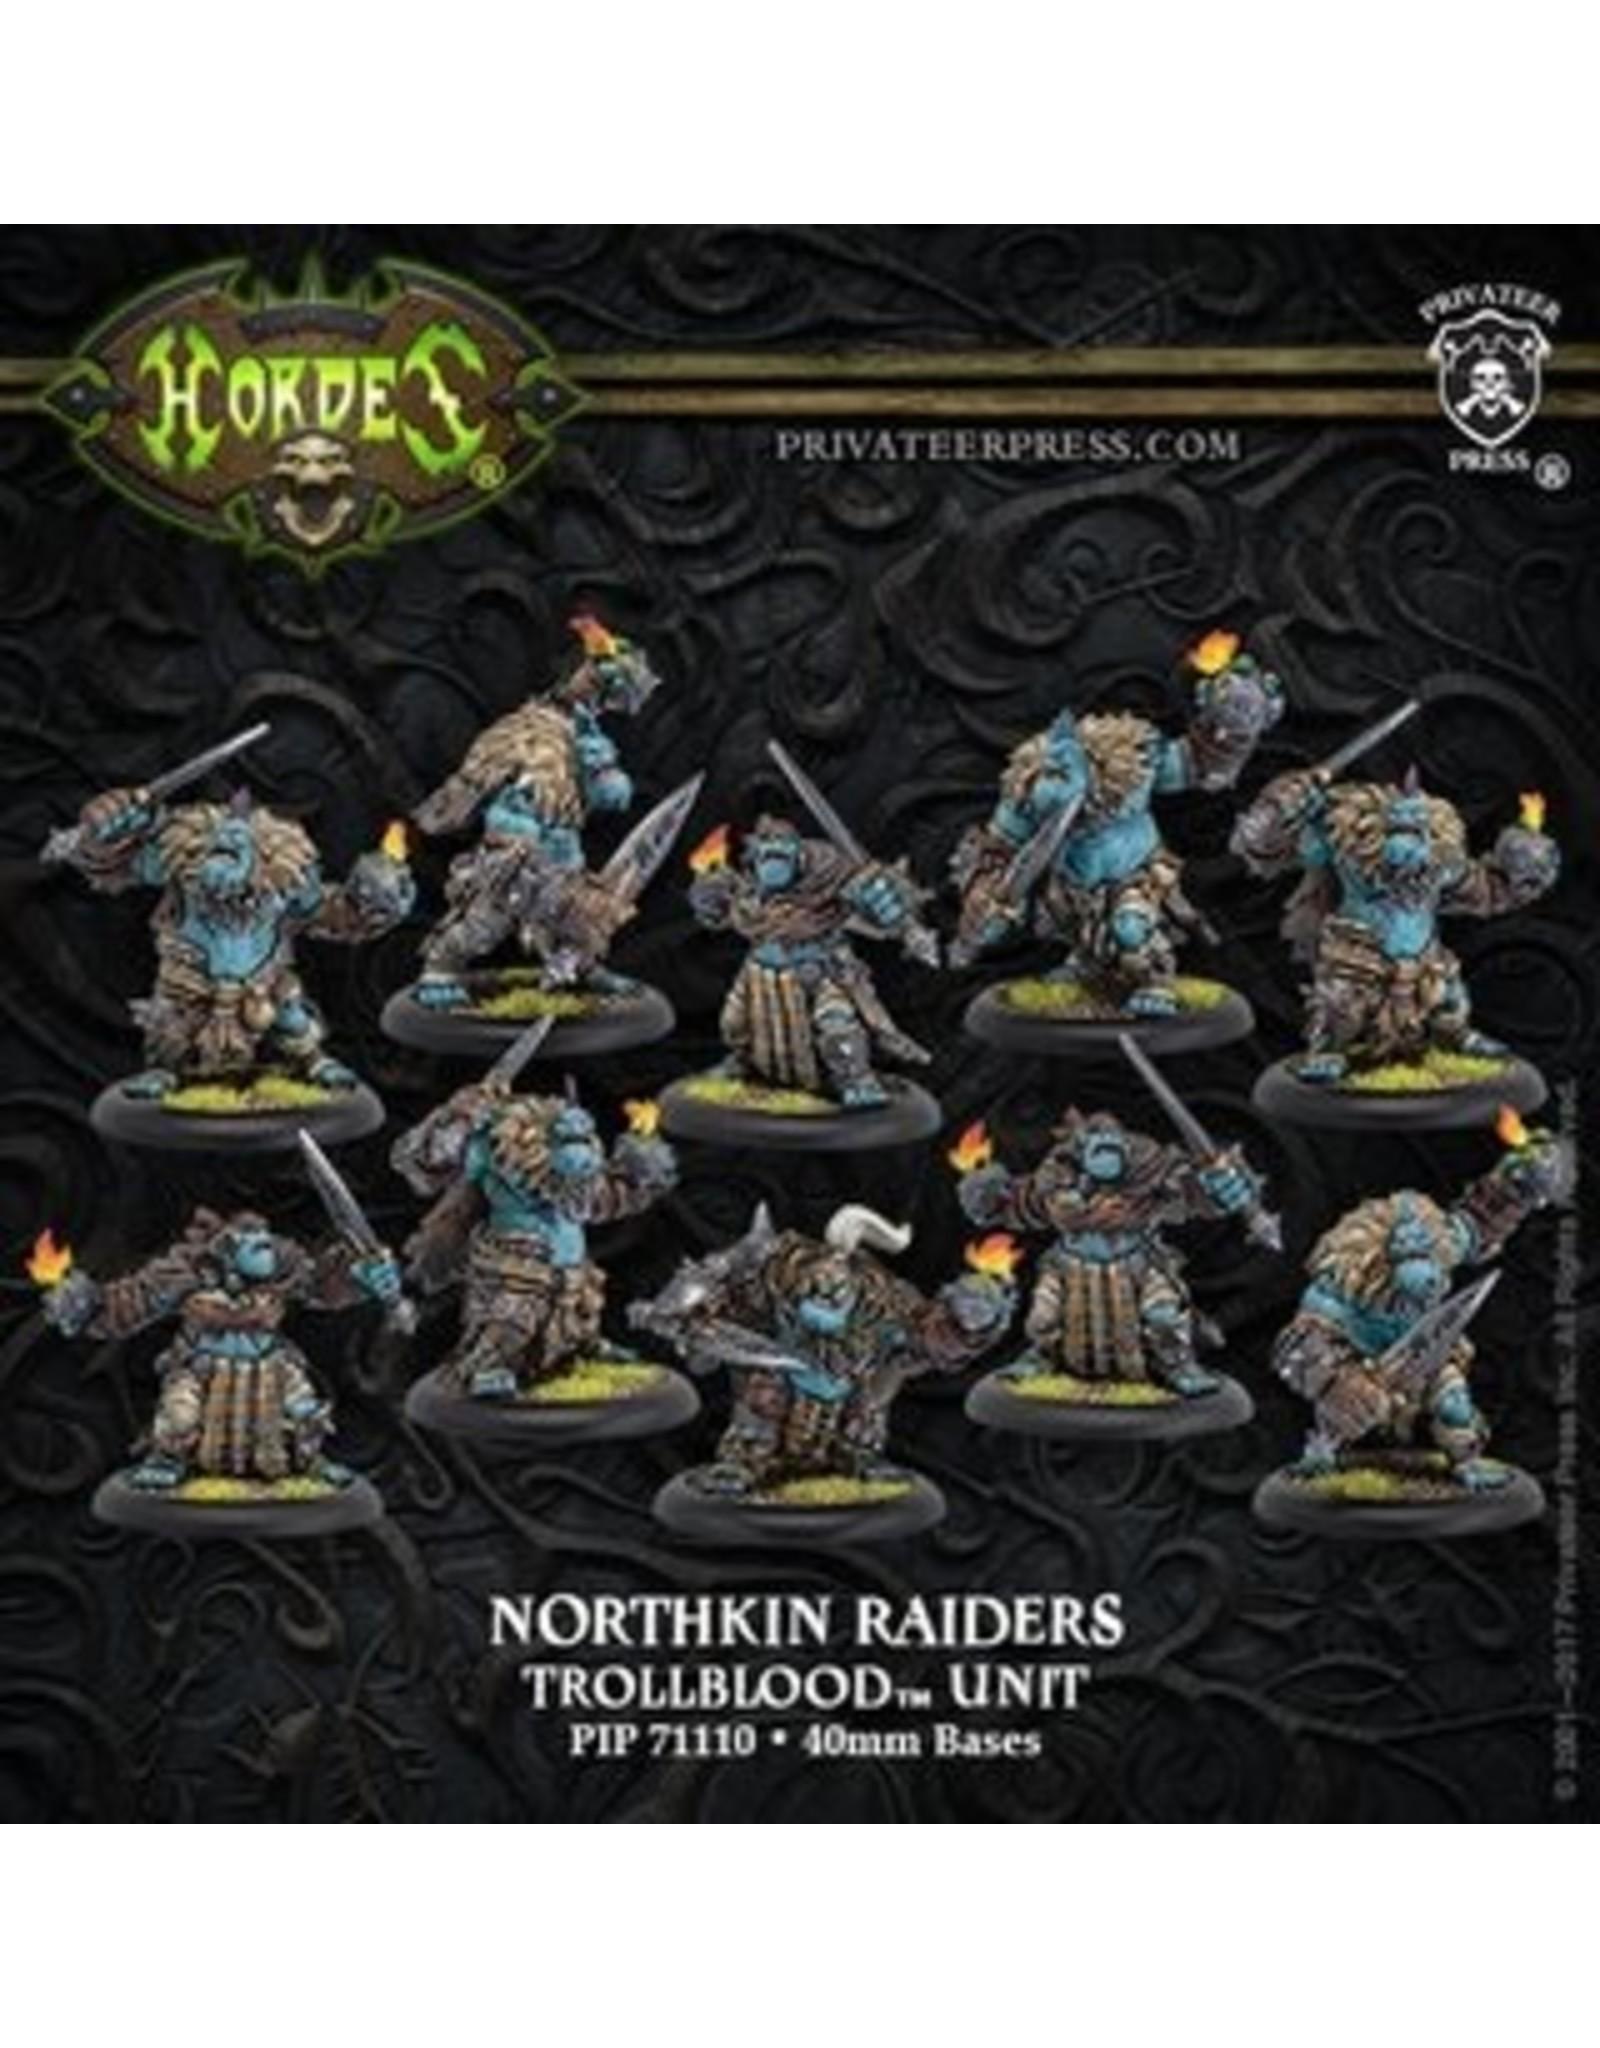 Hordes: Trollblood Northkin Raiders Unit Attachment (Resin/Metal)